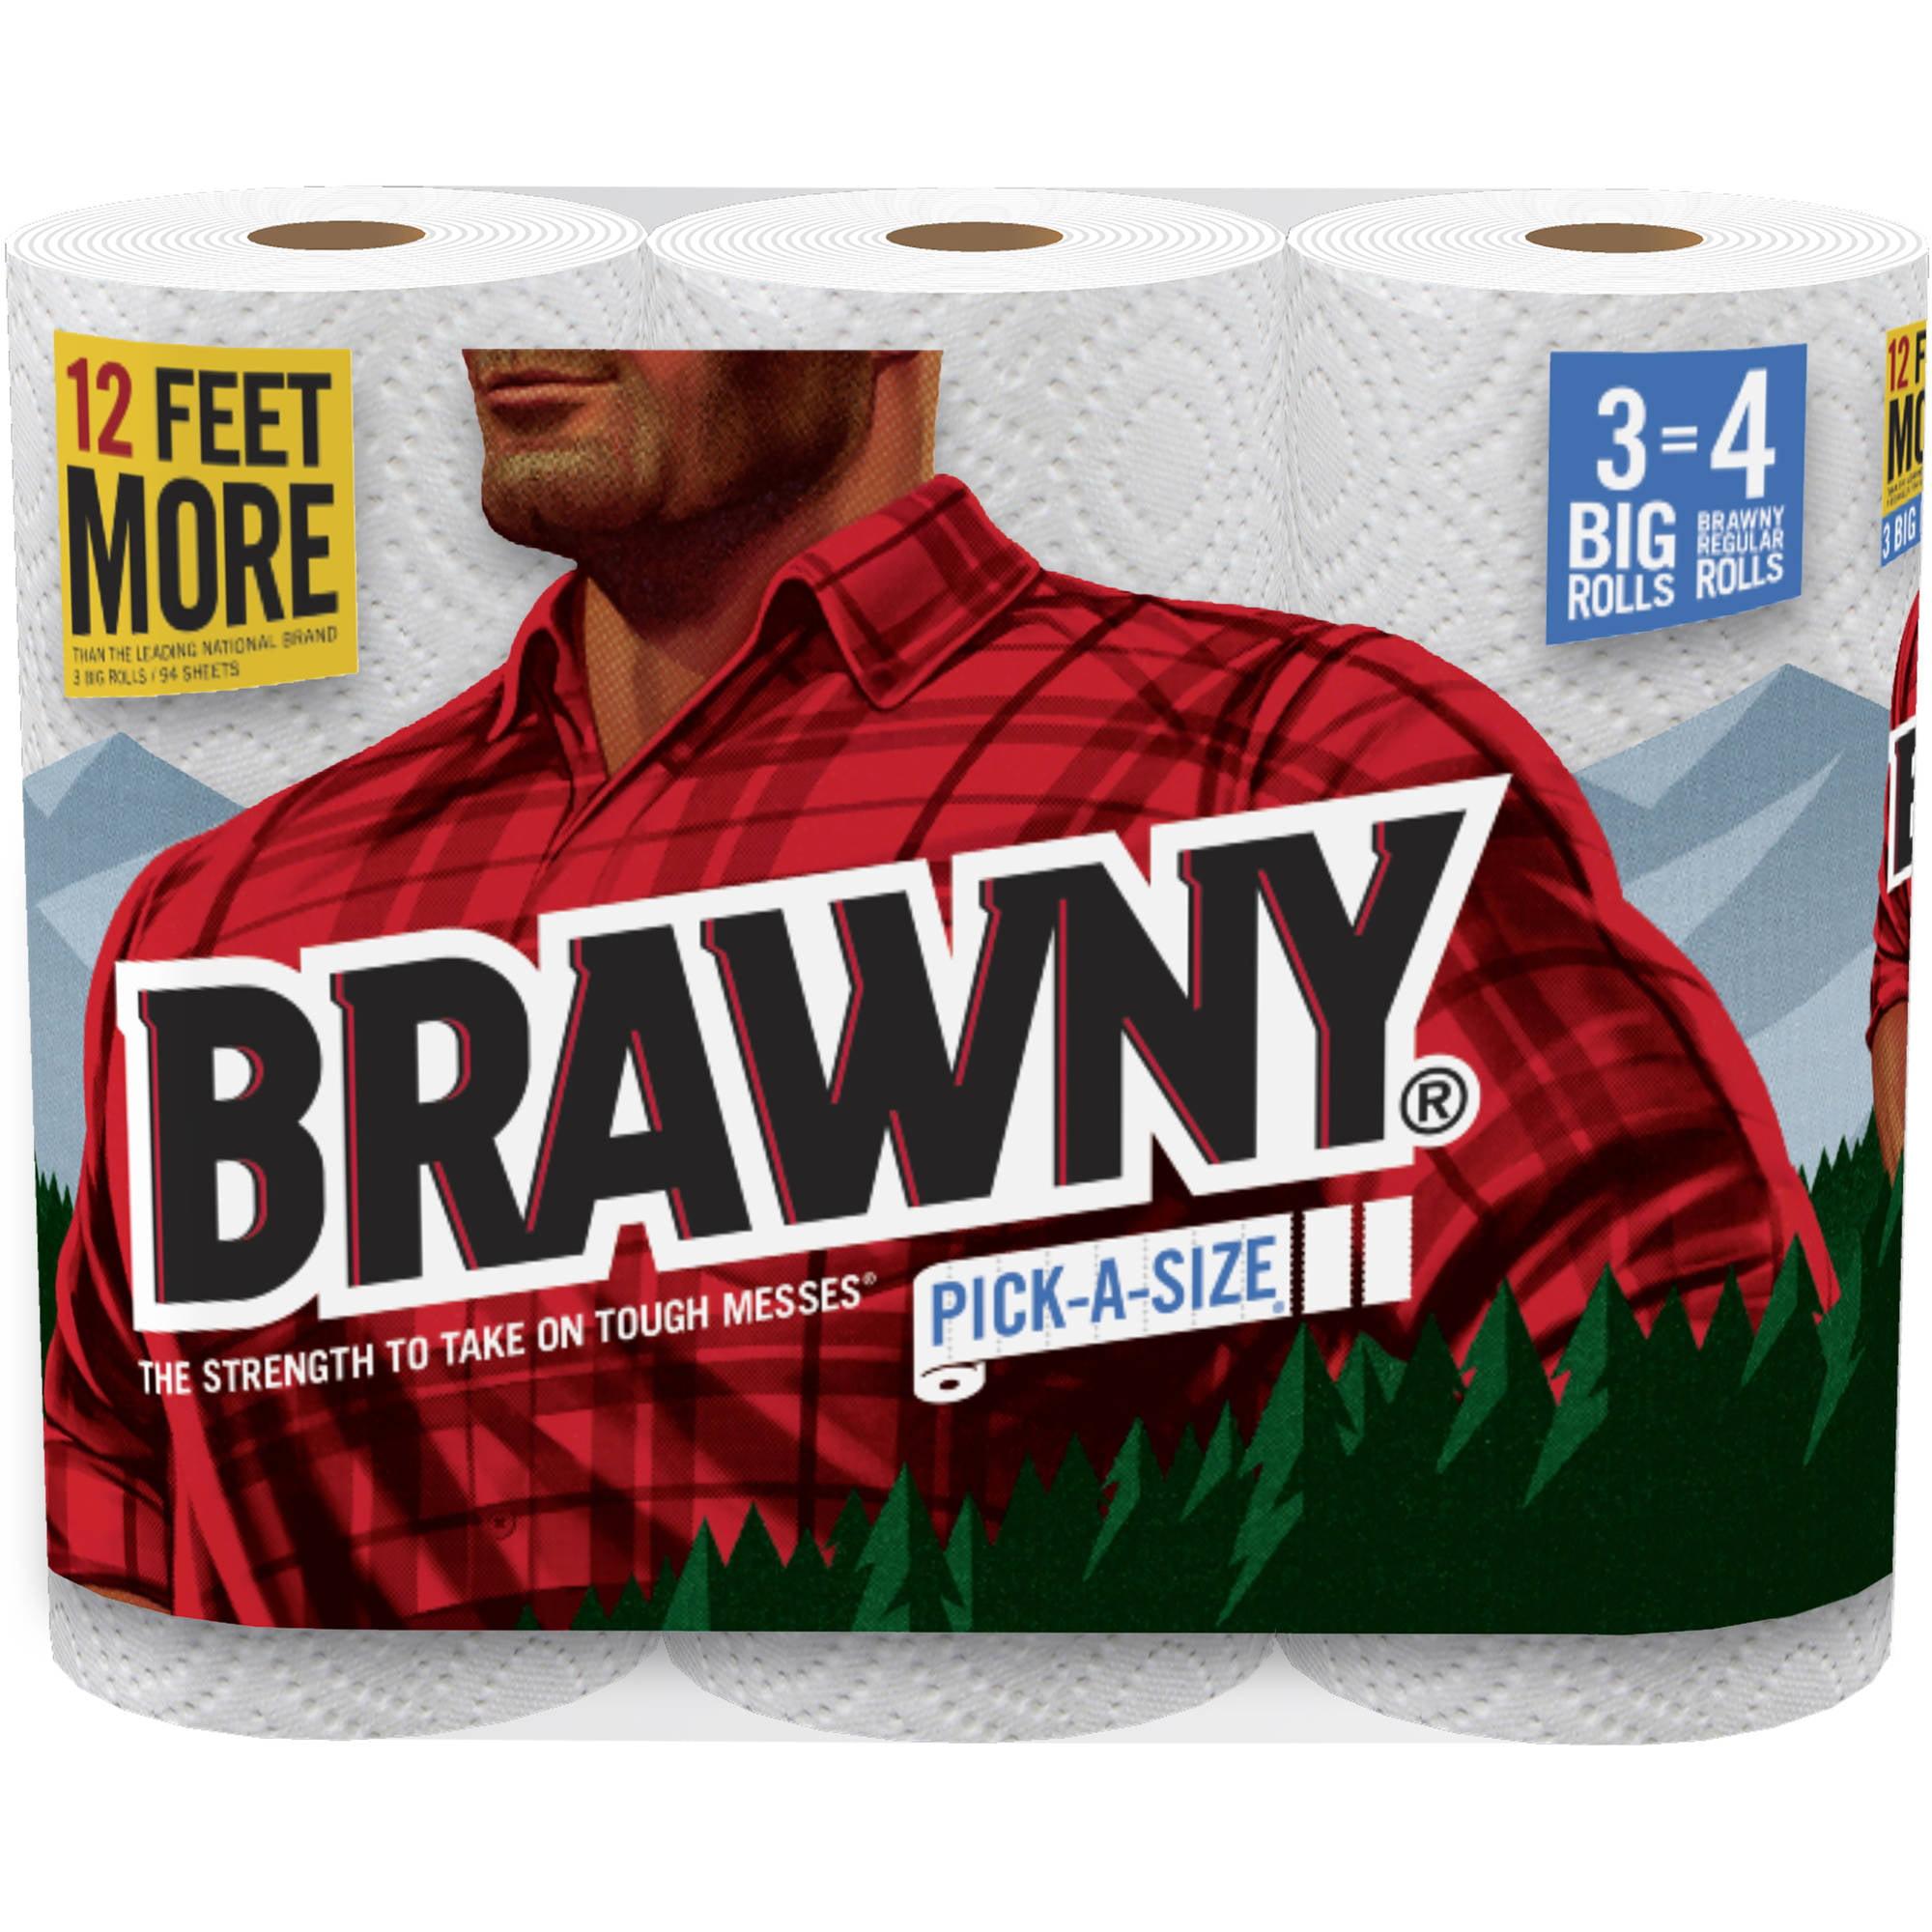 Brawny Pick-a-Size Big Roll Paper Towels, 104 sheets, 3 rolls